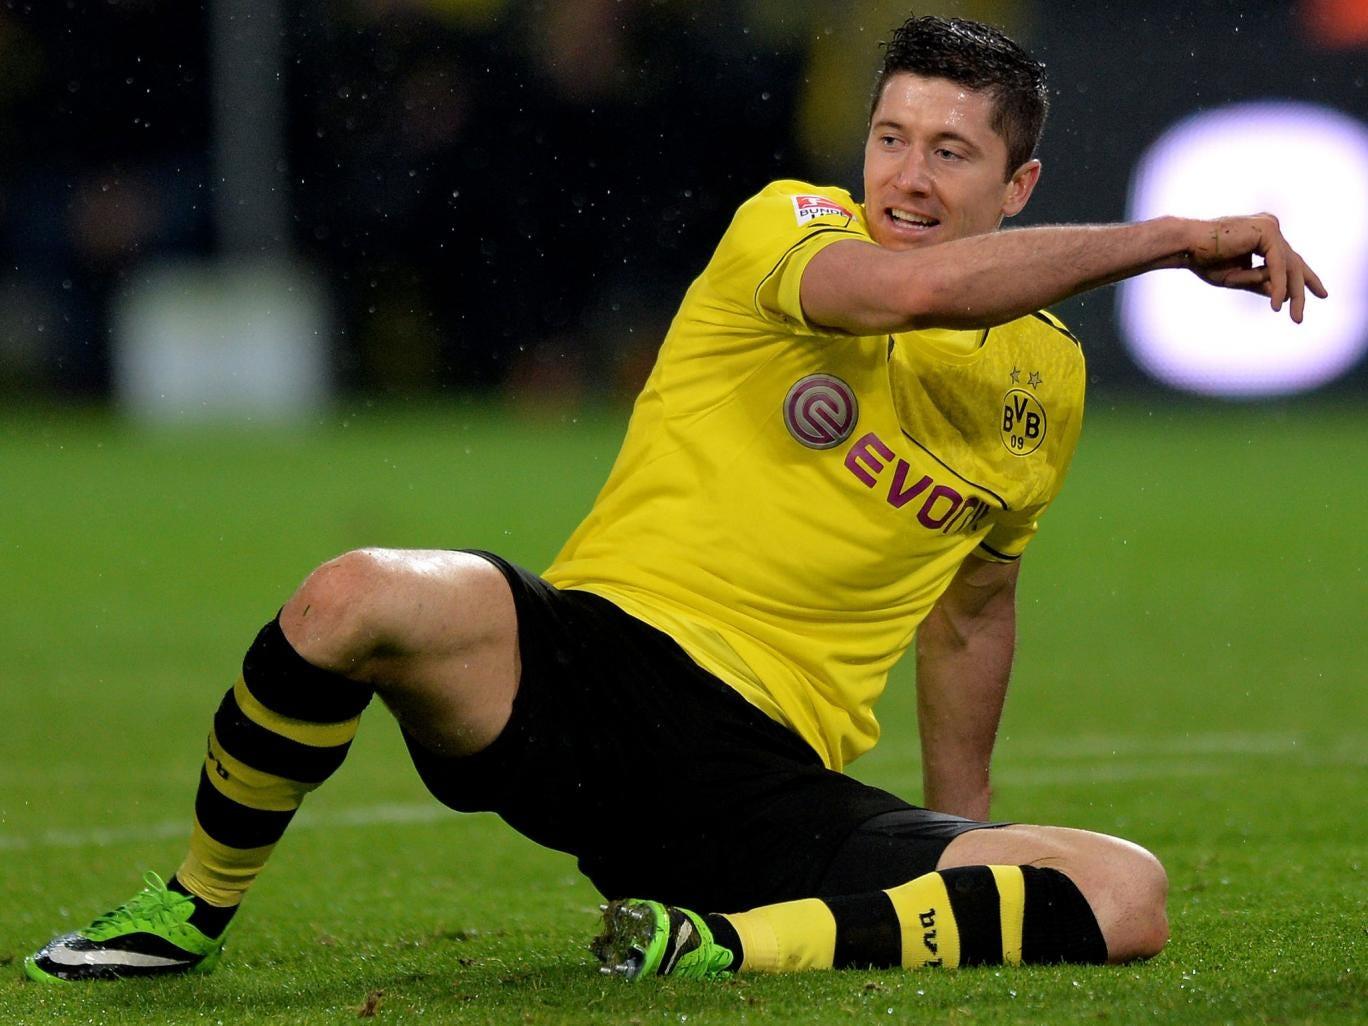 Borussia Dortmund striker Robert Lewandowski has decided on his future